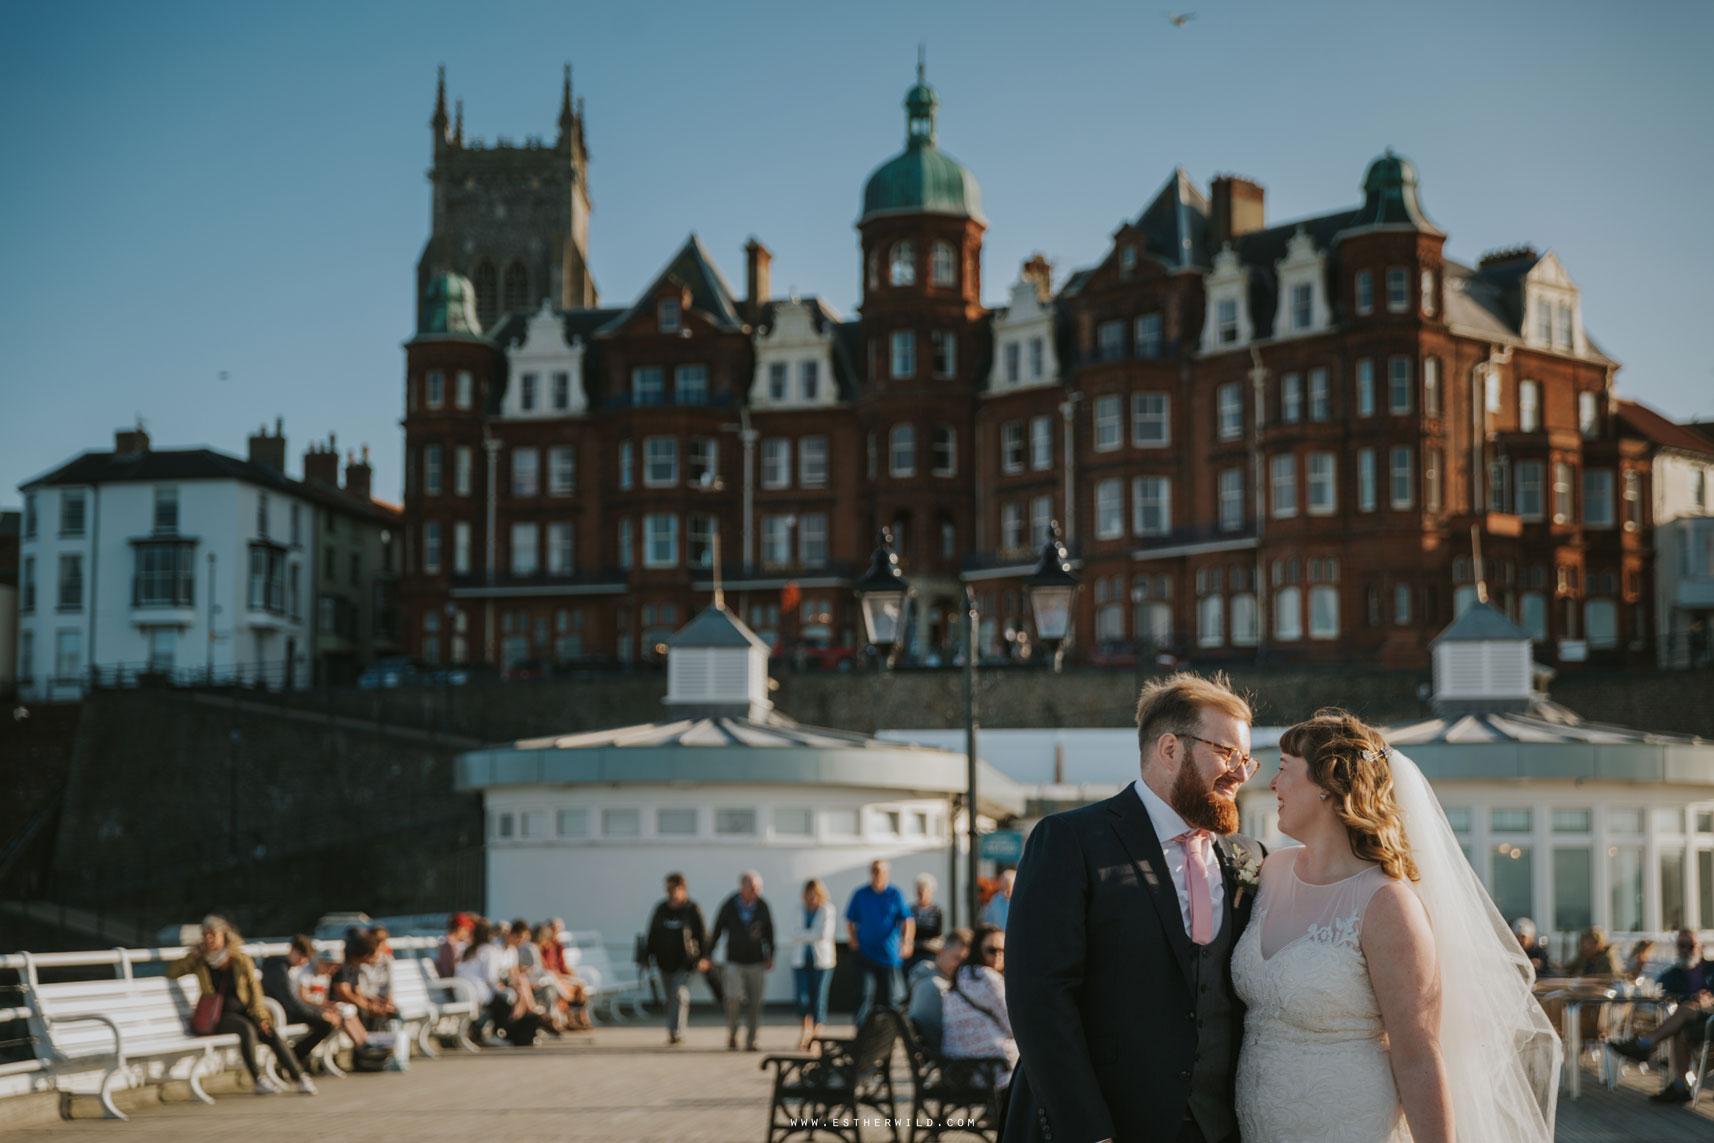 Cromer_Wedding_Beach_Outdoor_Ceremony_Norfolk_North_Lodge_Registry_Office_Rocket_House_Cafe_Cromer_Pier_IMG_4655_IMGL8403.jpg